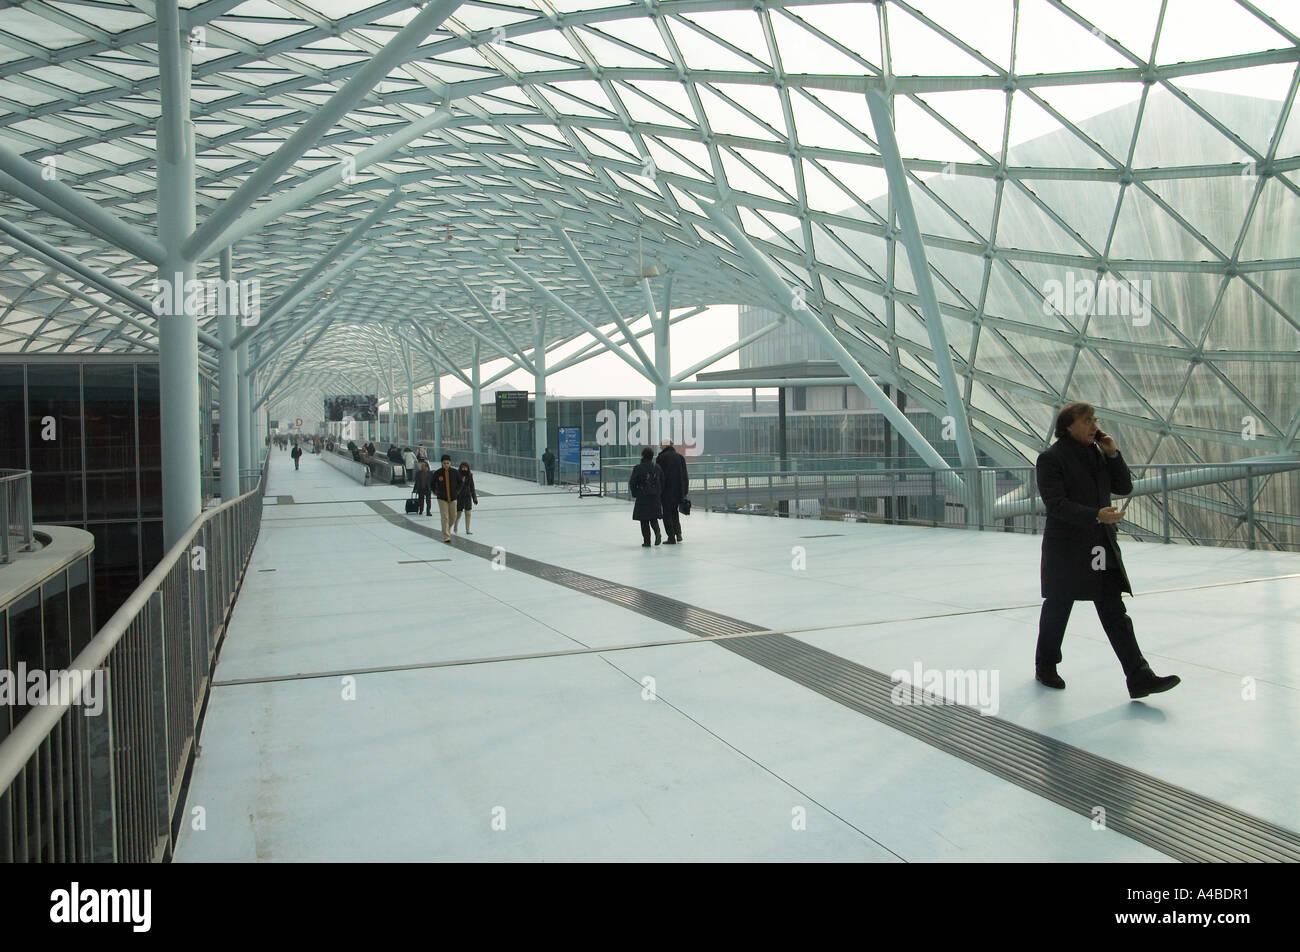 New fiera milano rho pero by architect massimiliano fuksas for Fiera milano rho